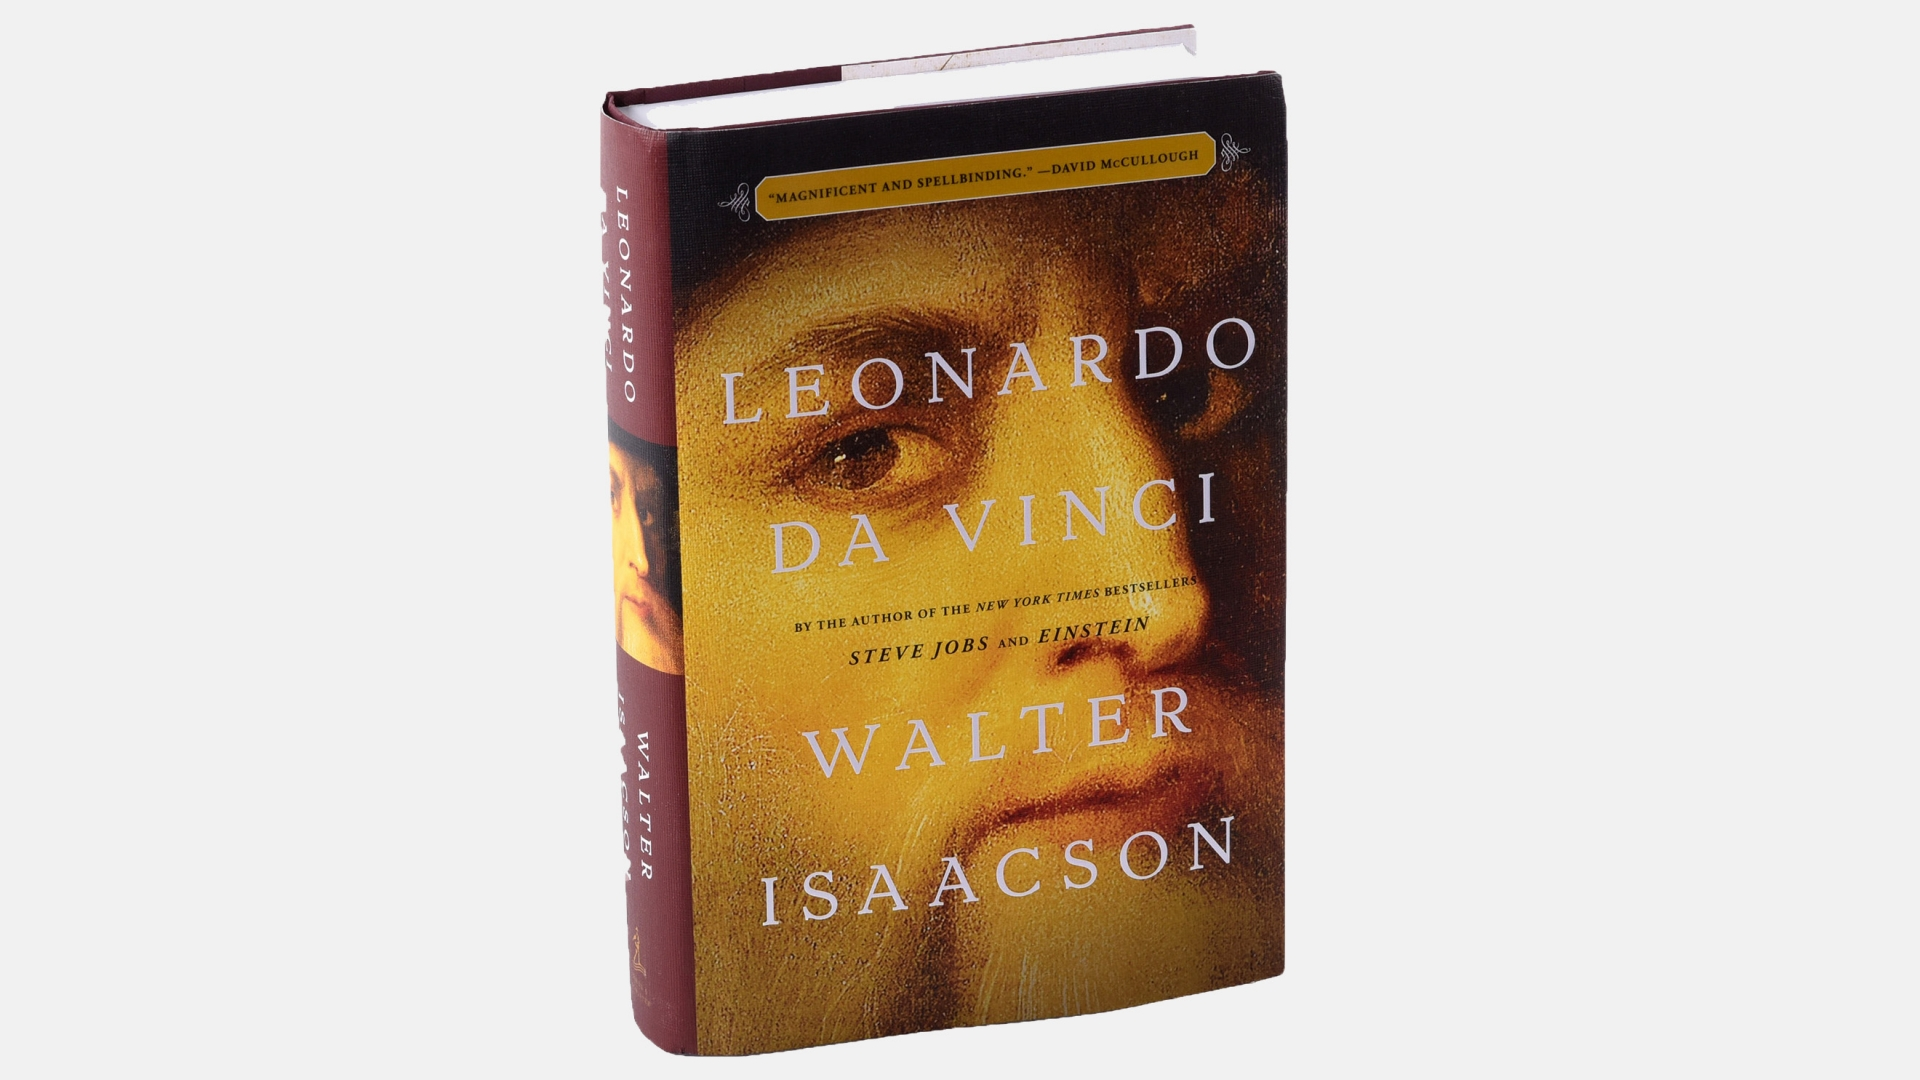 Leonardo Da Vinci, by Walter Isaacson. (Credit: Bill O'Leary/The Washington Post via Getty Images)